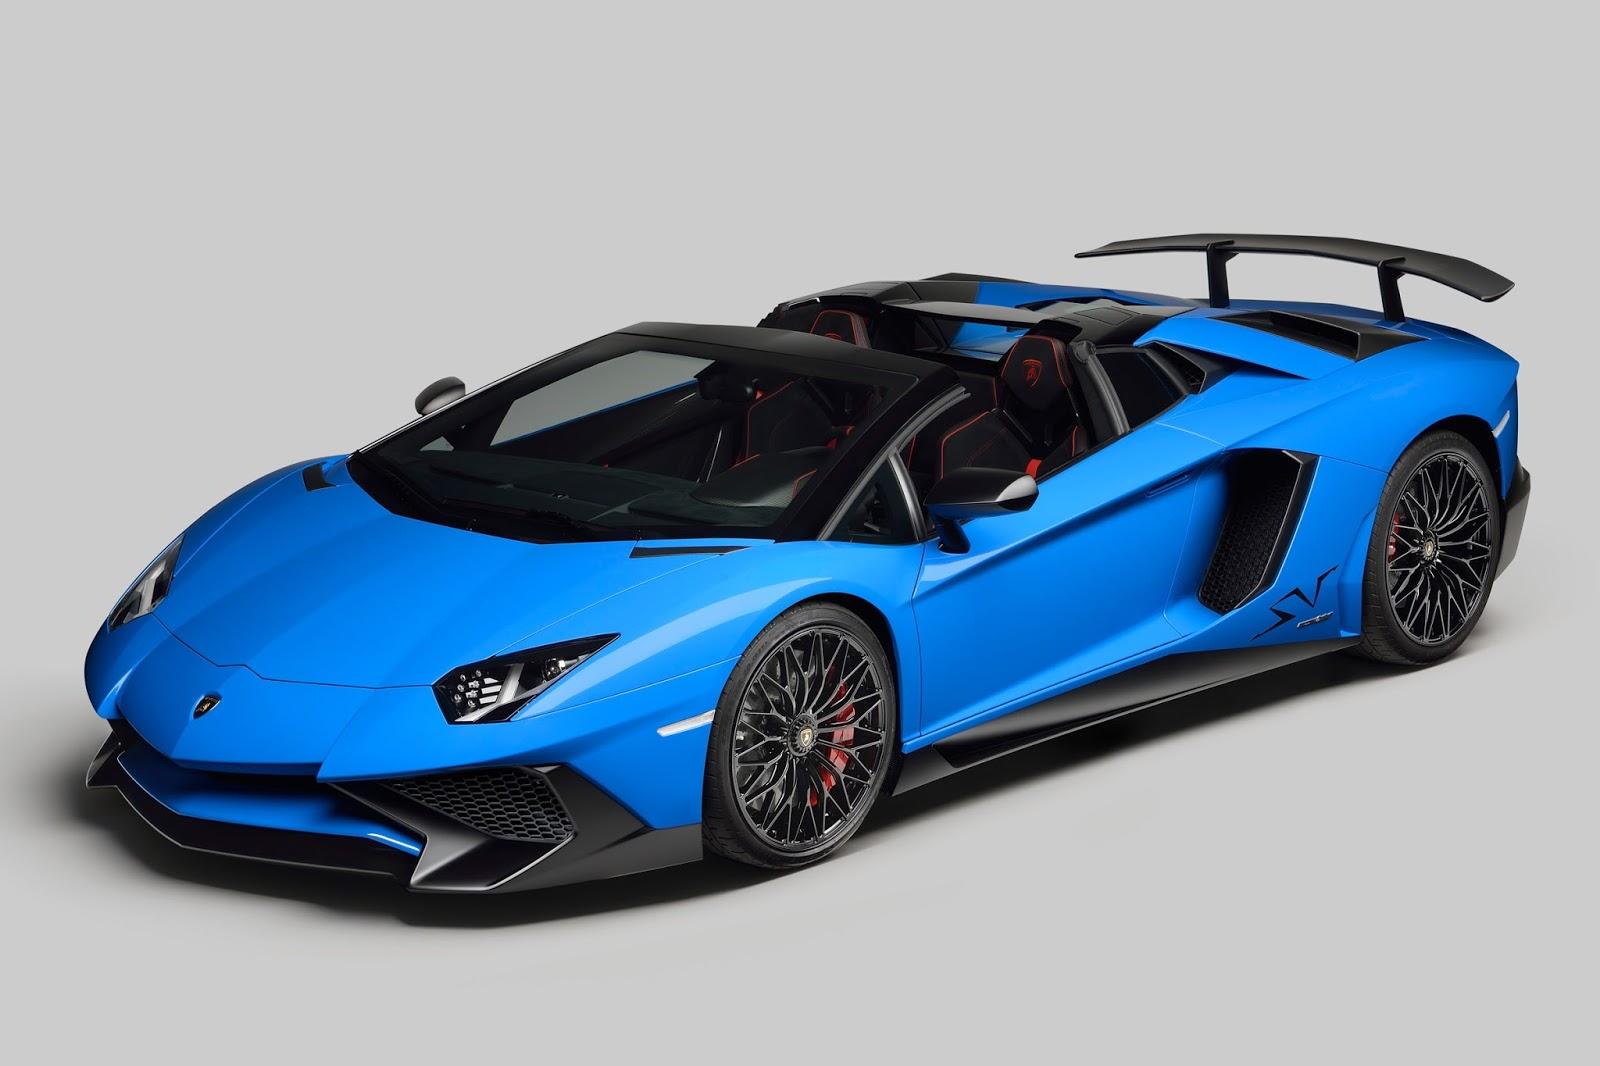 Lamborghini Aventador Price And Specifications Wheelnut